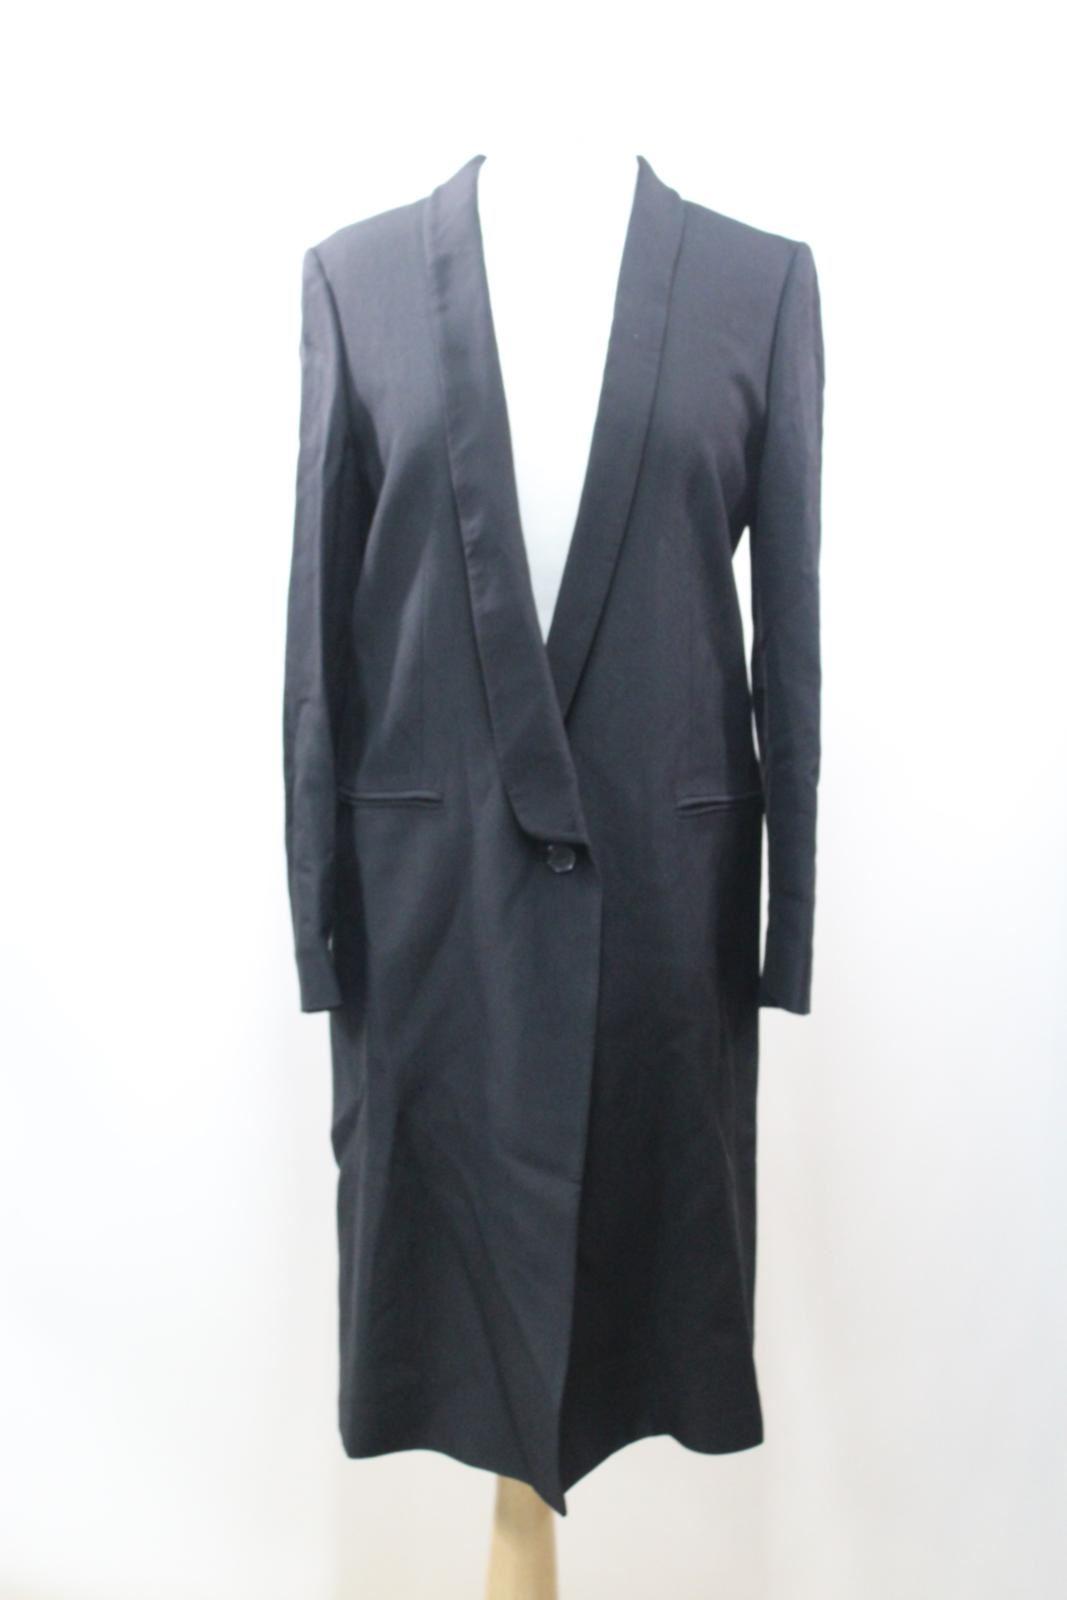 BNWT-JAEGER-Ladies-Black-Wool-Blend-Formal-Single-Breasted-One-Button-Coat-UK10